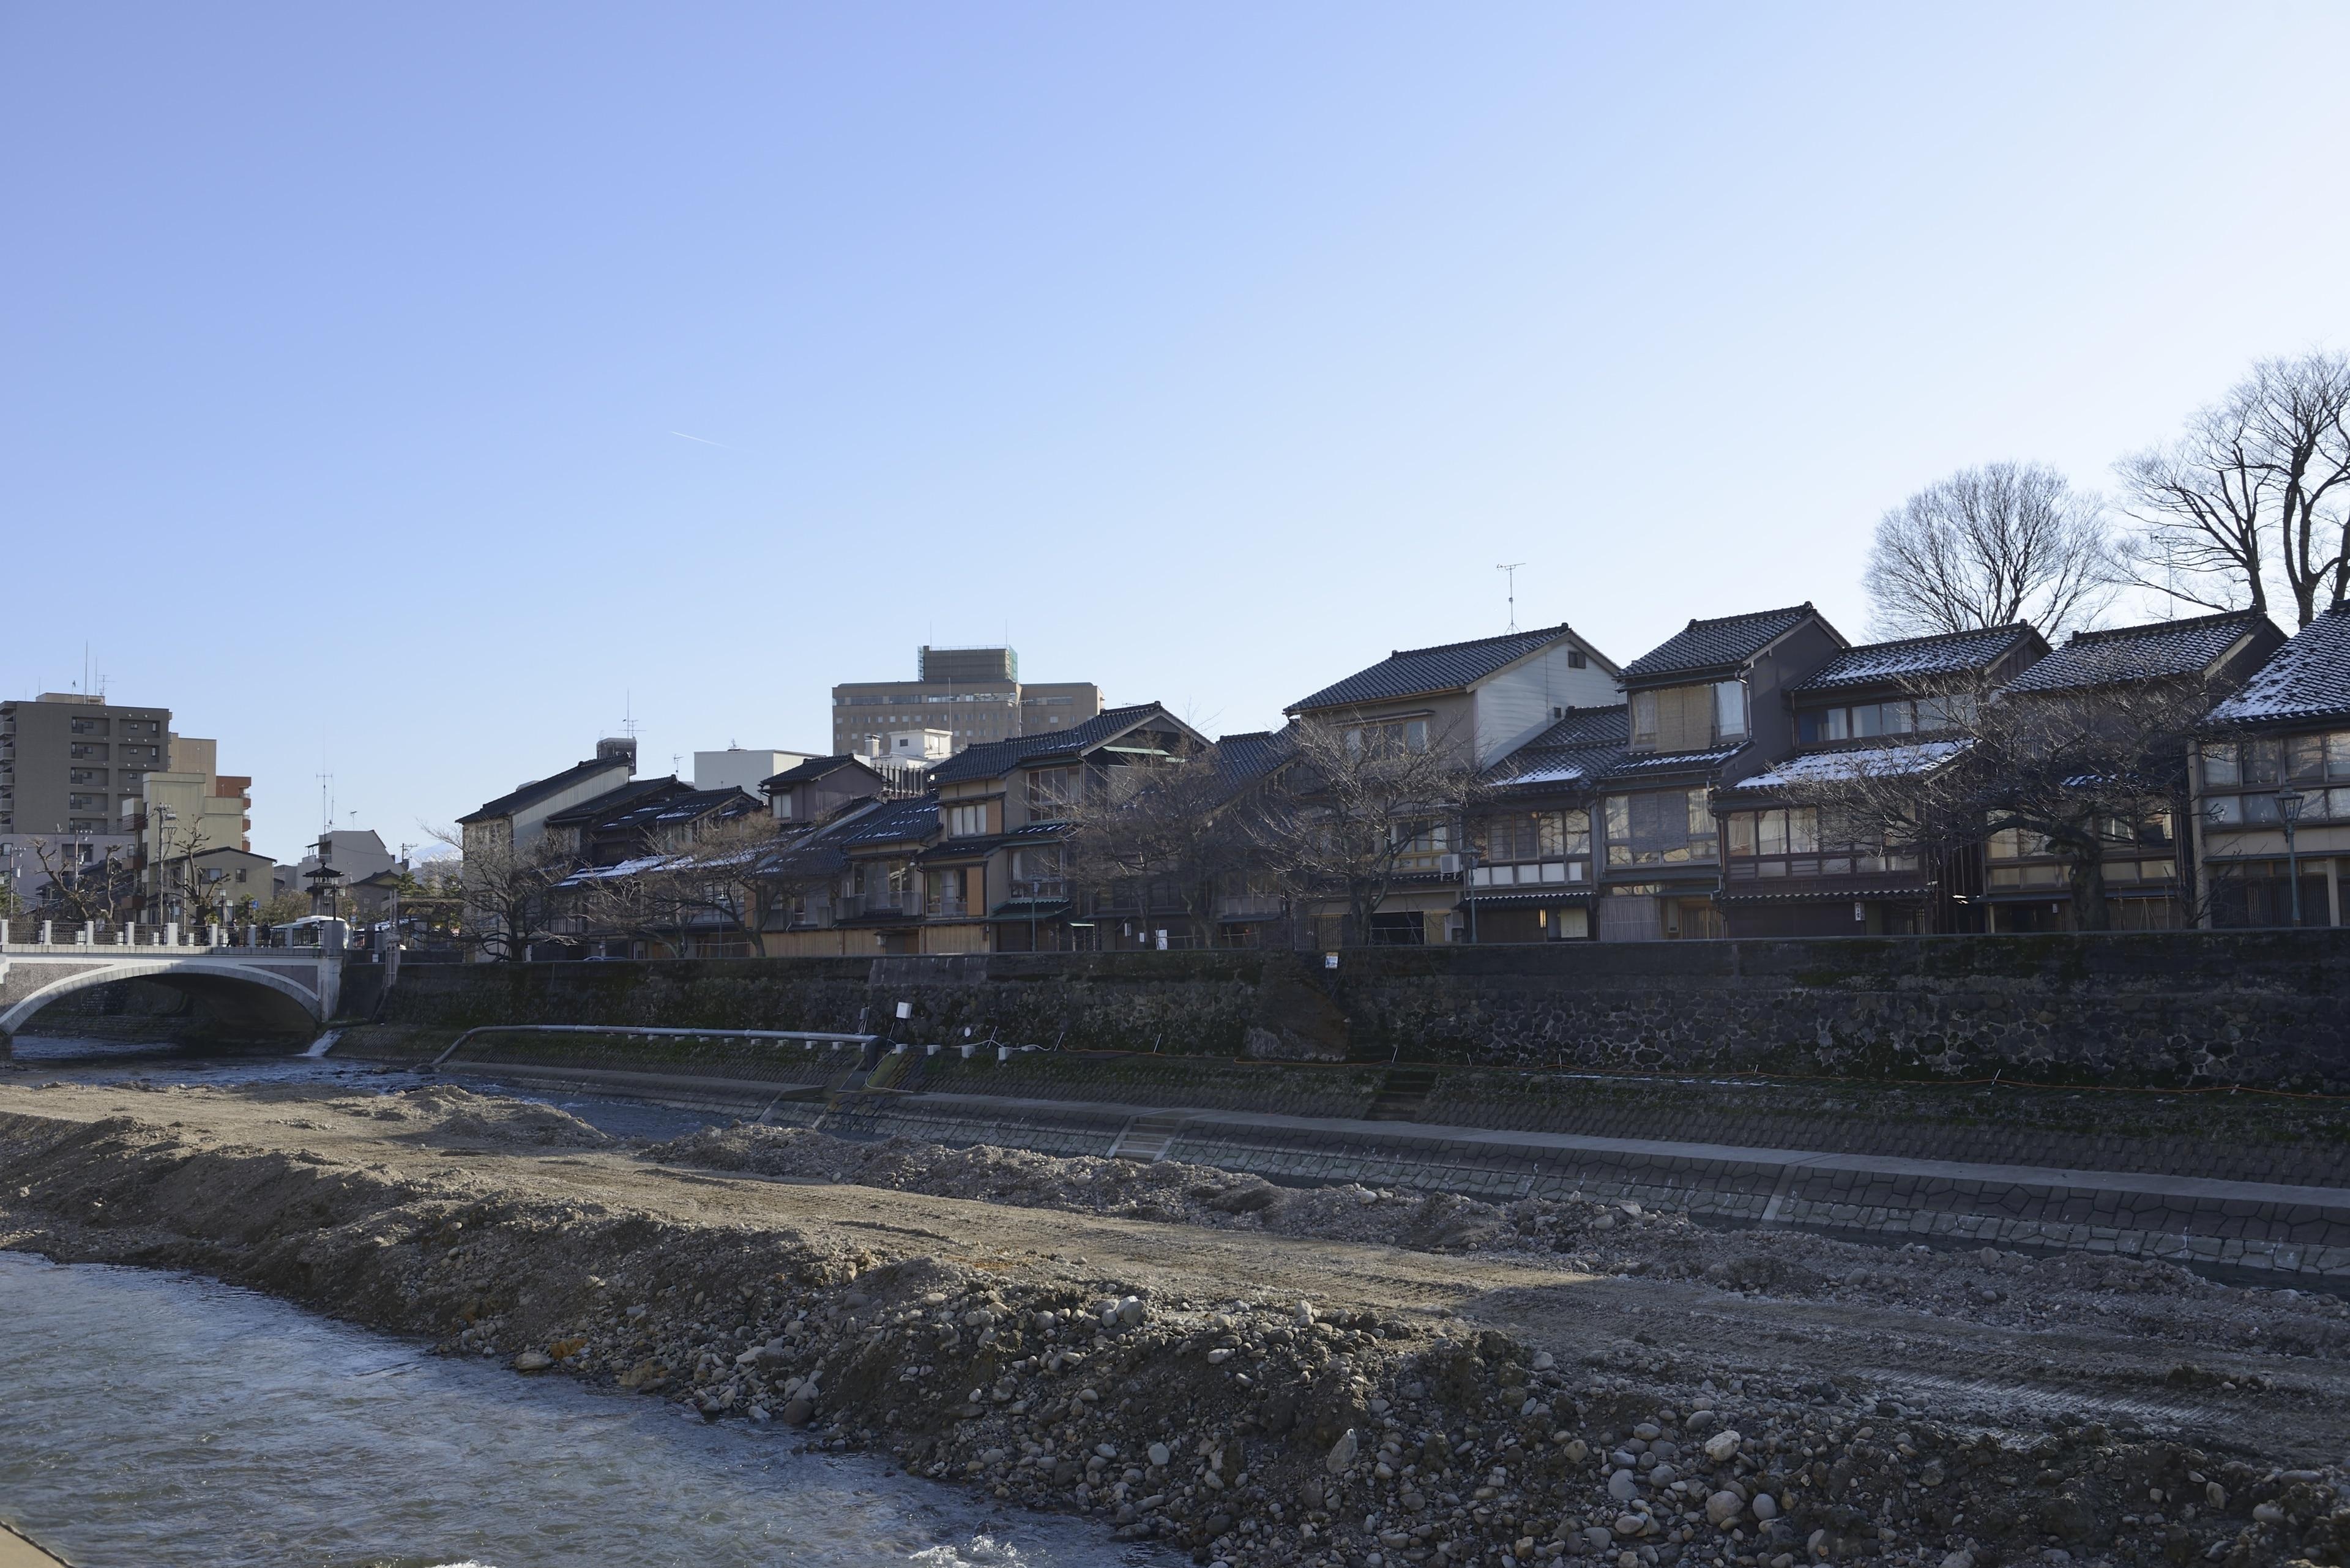 Higashiyama, Kanazawa, Ishikawa (prefektur), Japan